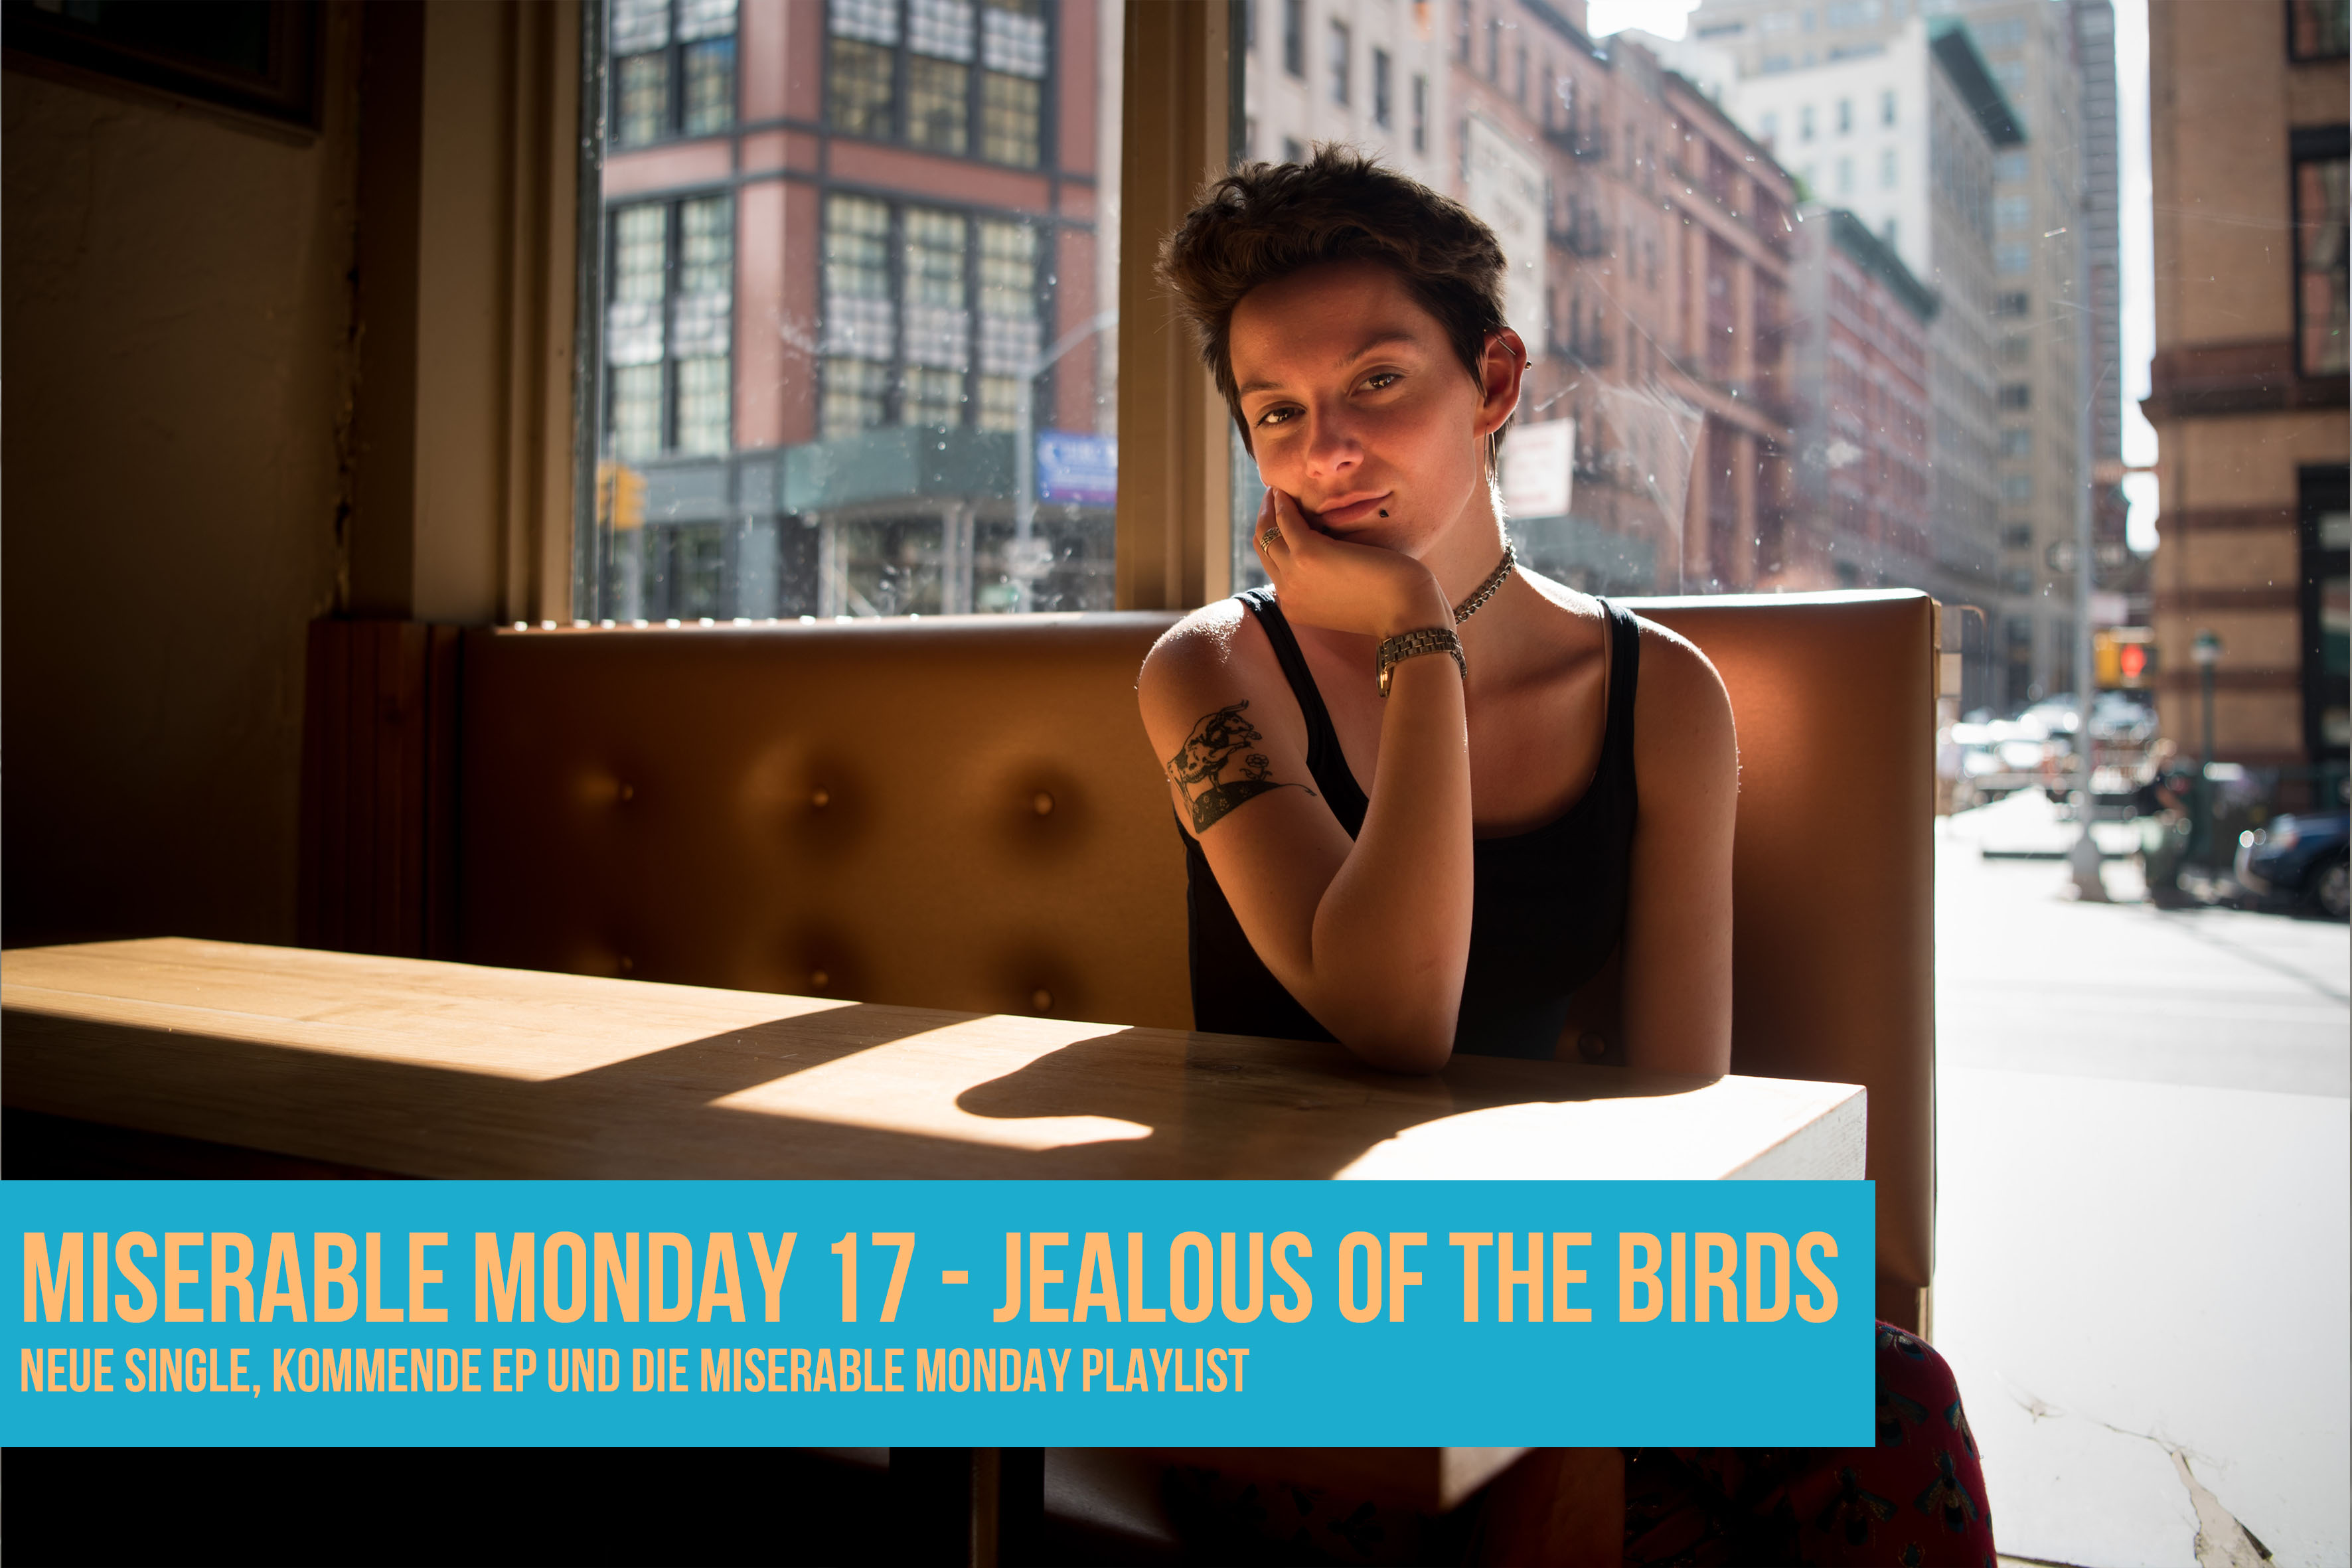 017 - Jealous Of The Birds